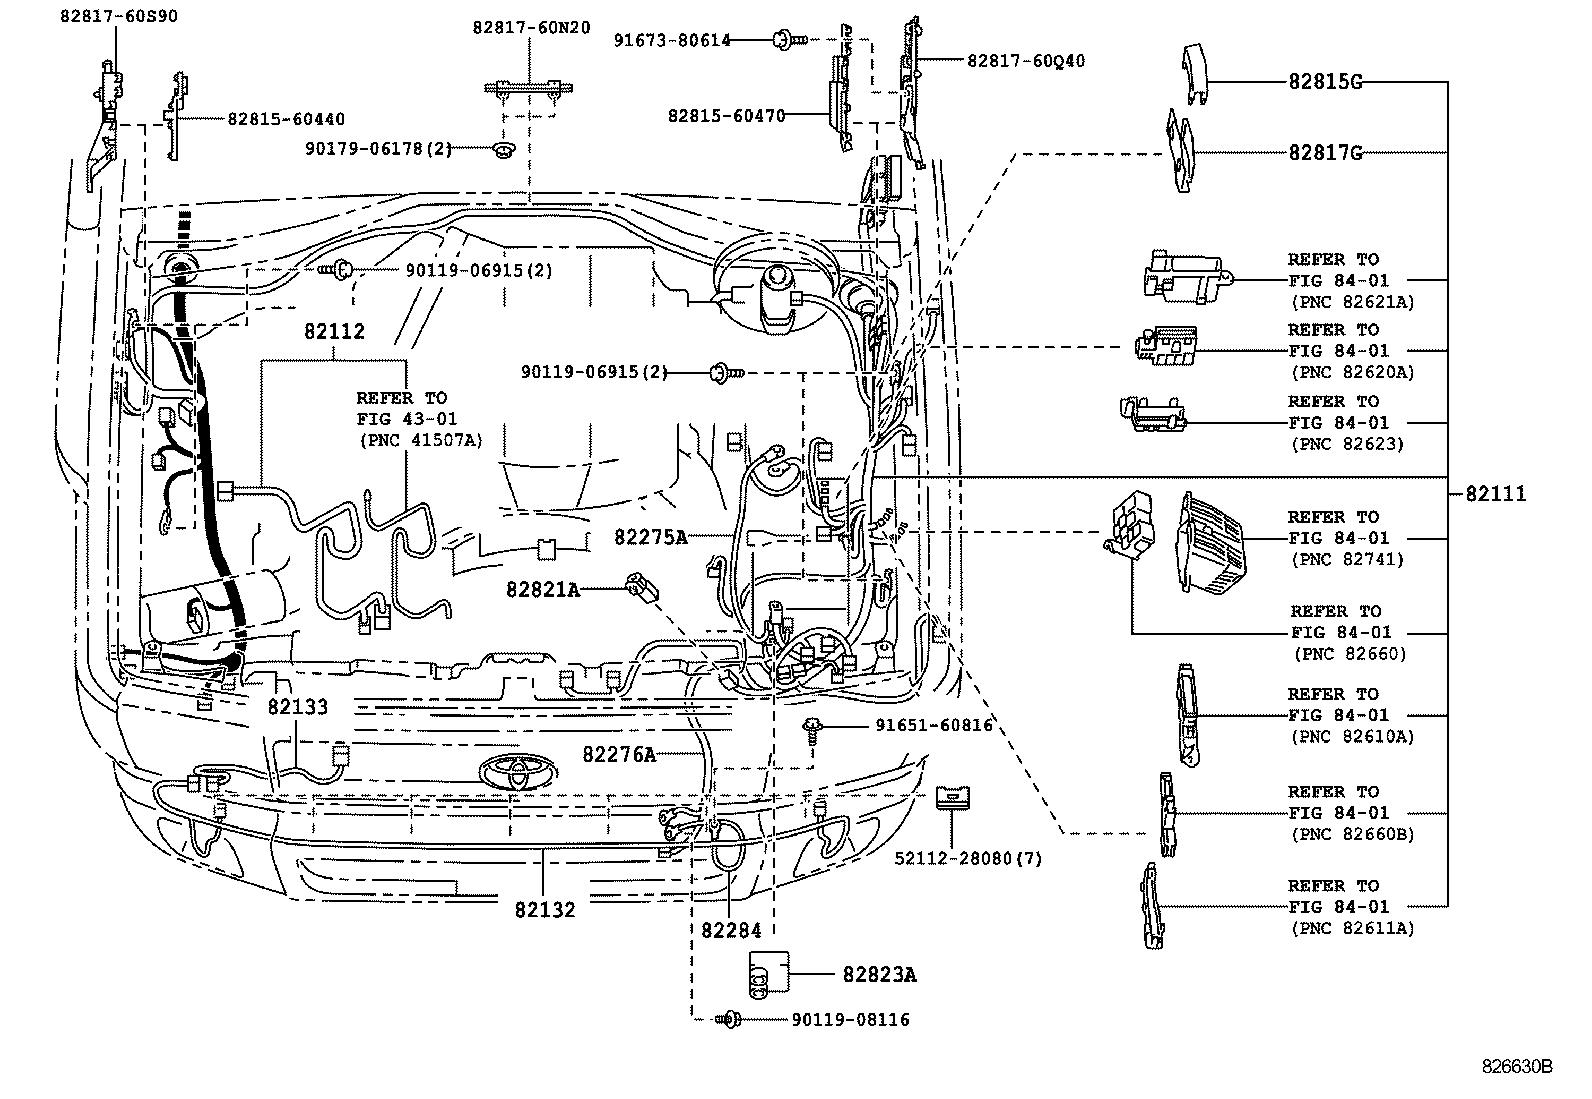 toyota land cruiser 70hzj78l-rjmrs - electrical